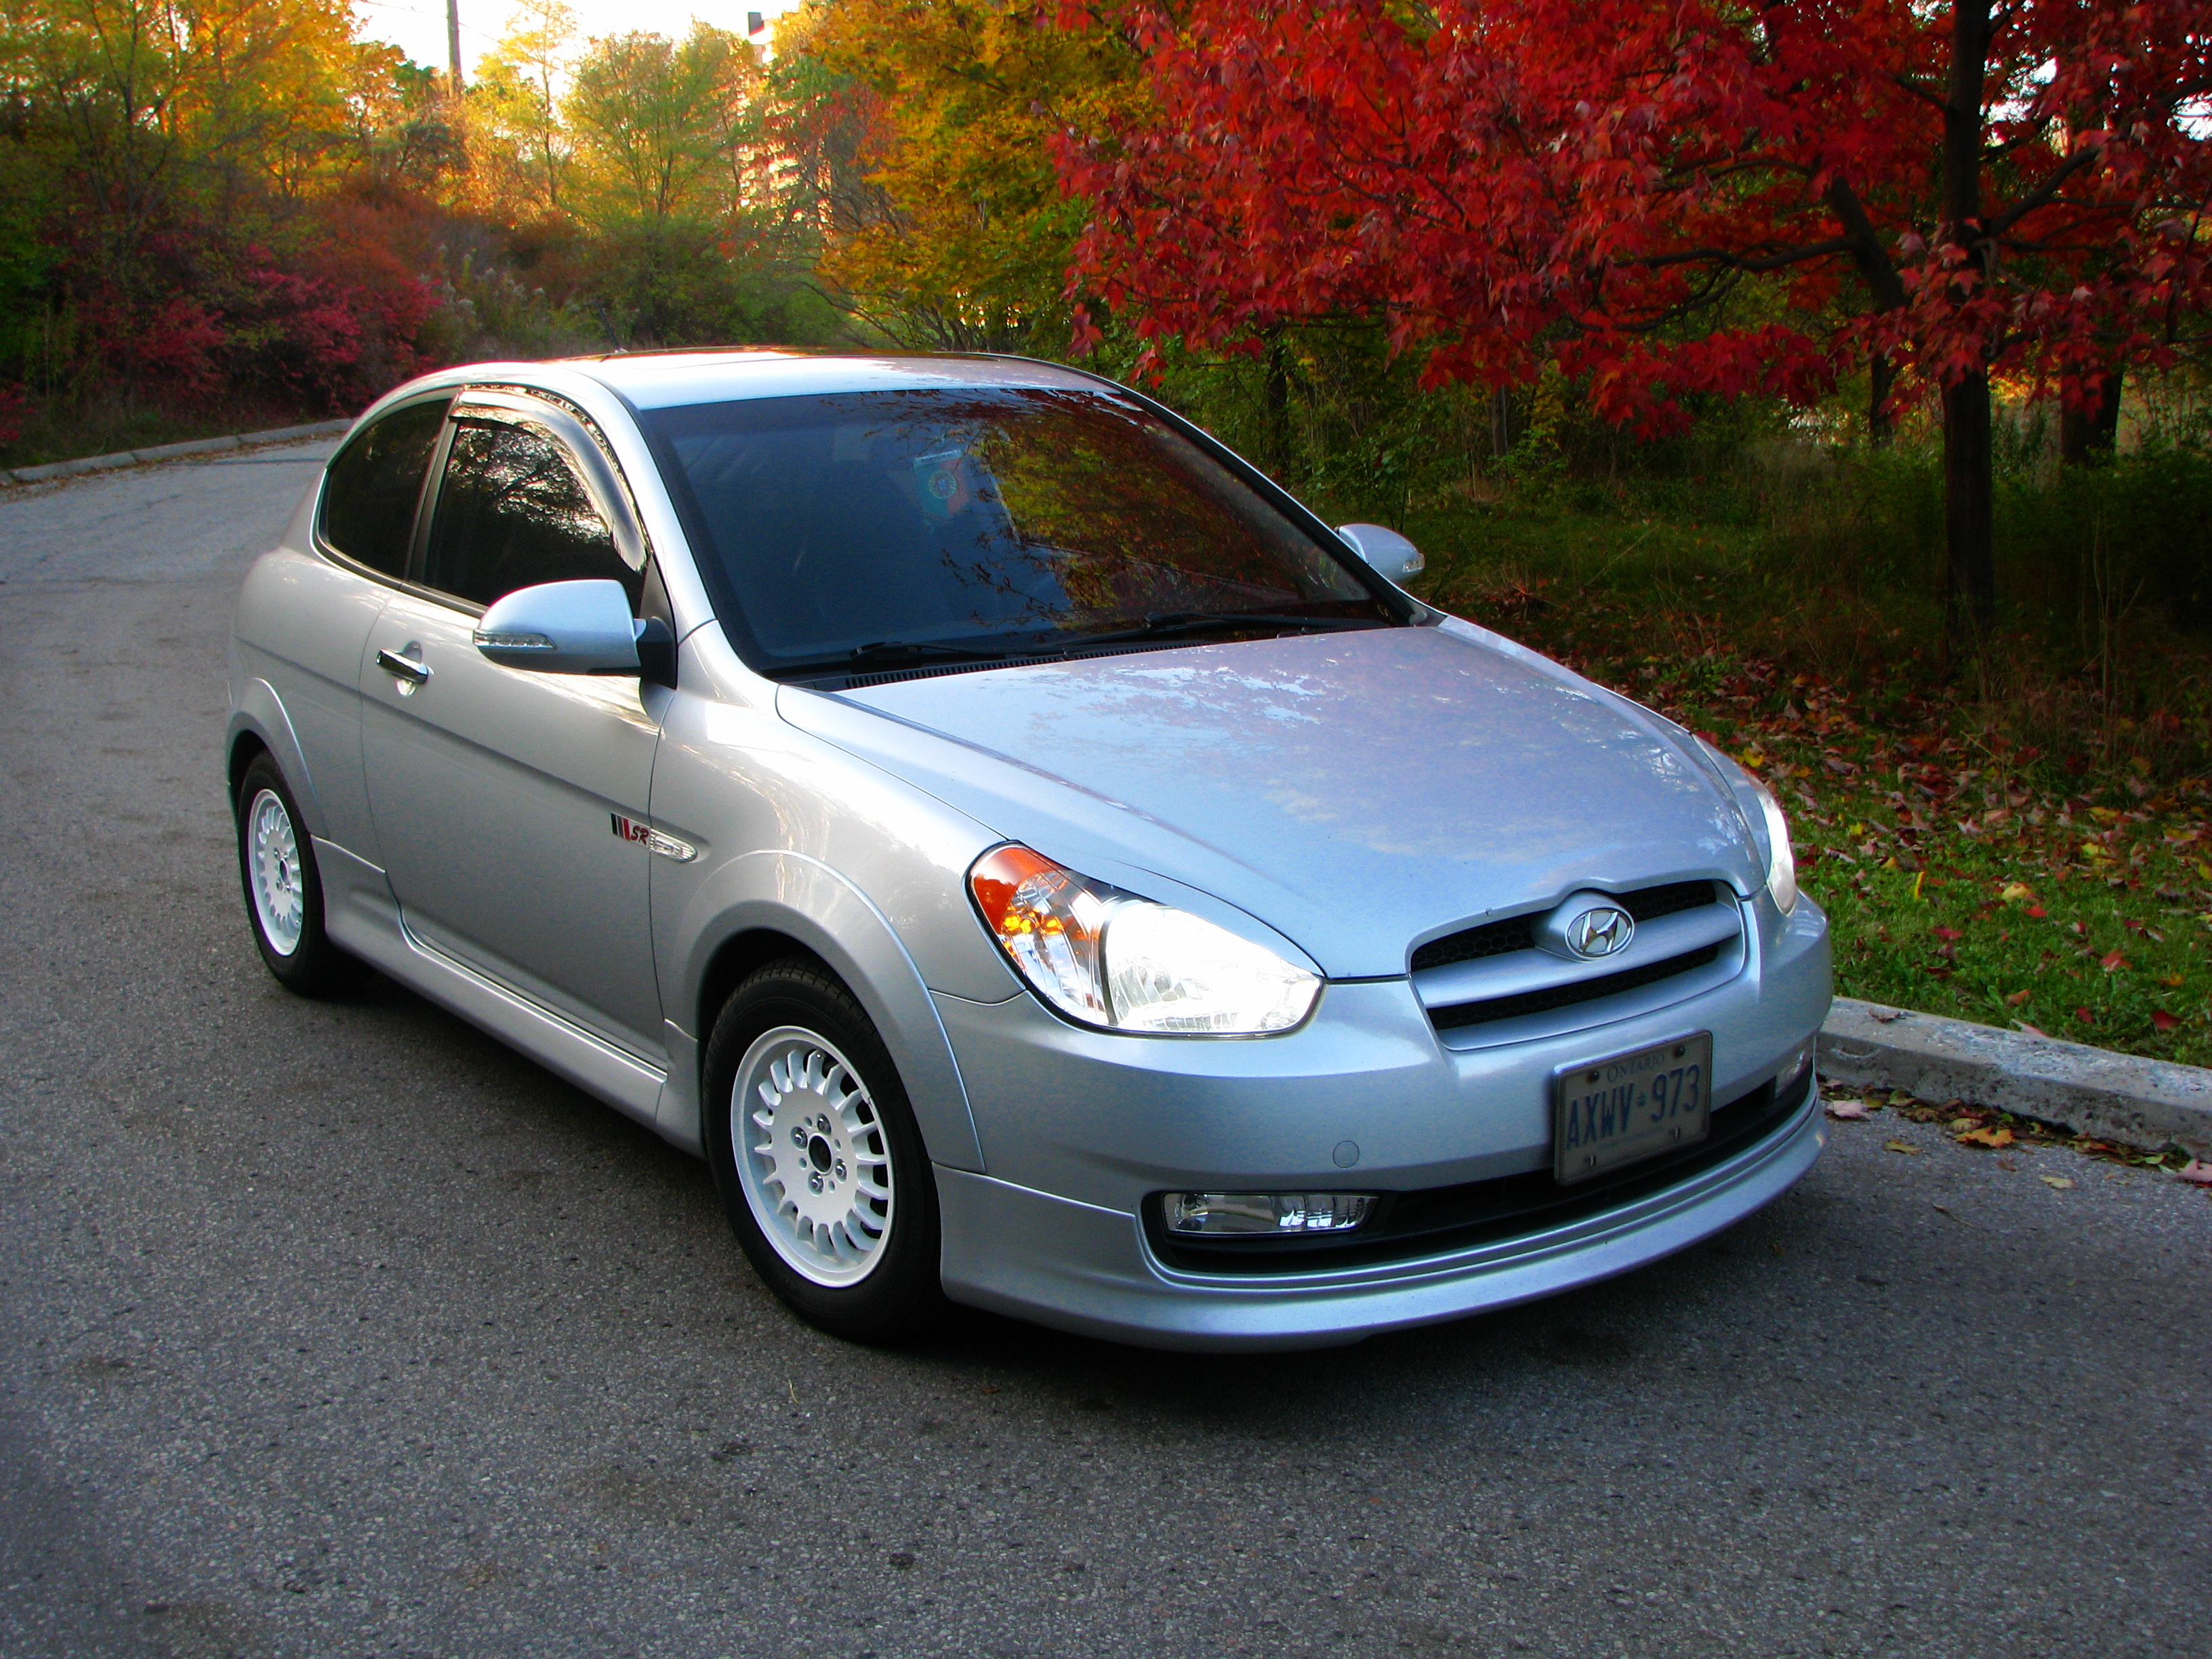 File Hyundai Accent Rally Car 4043685859 Jpg Wikimedia Commons